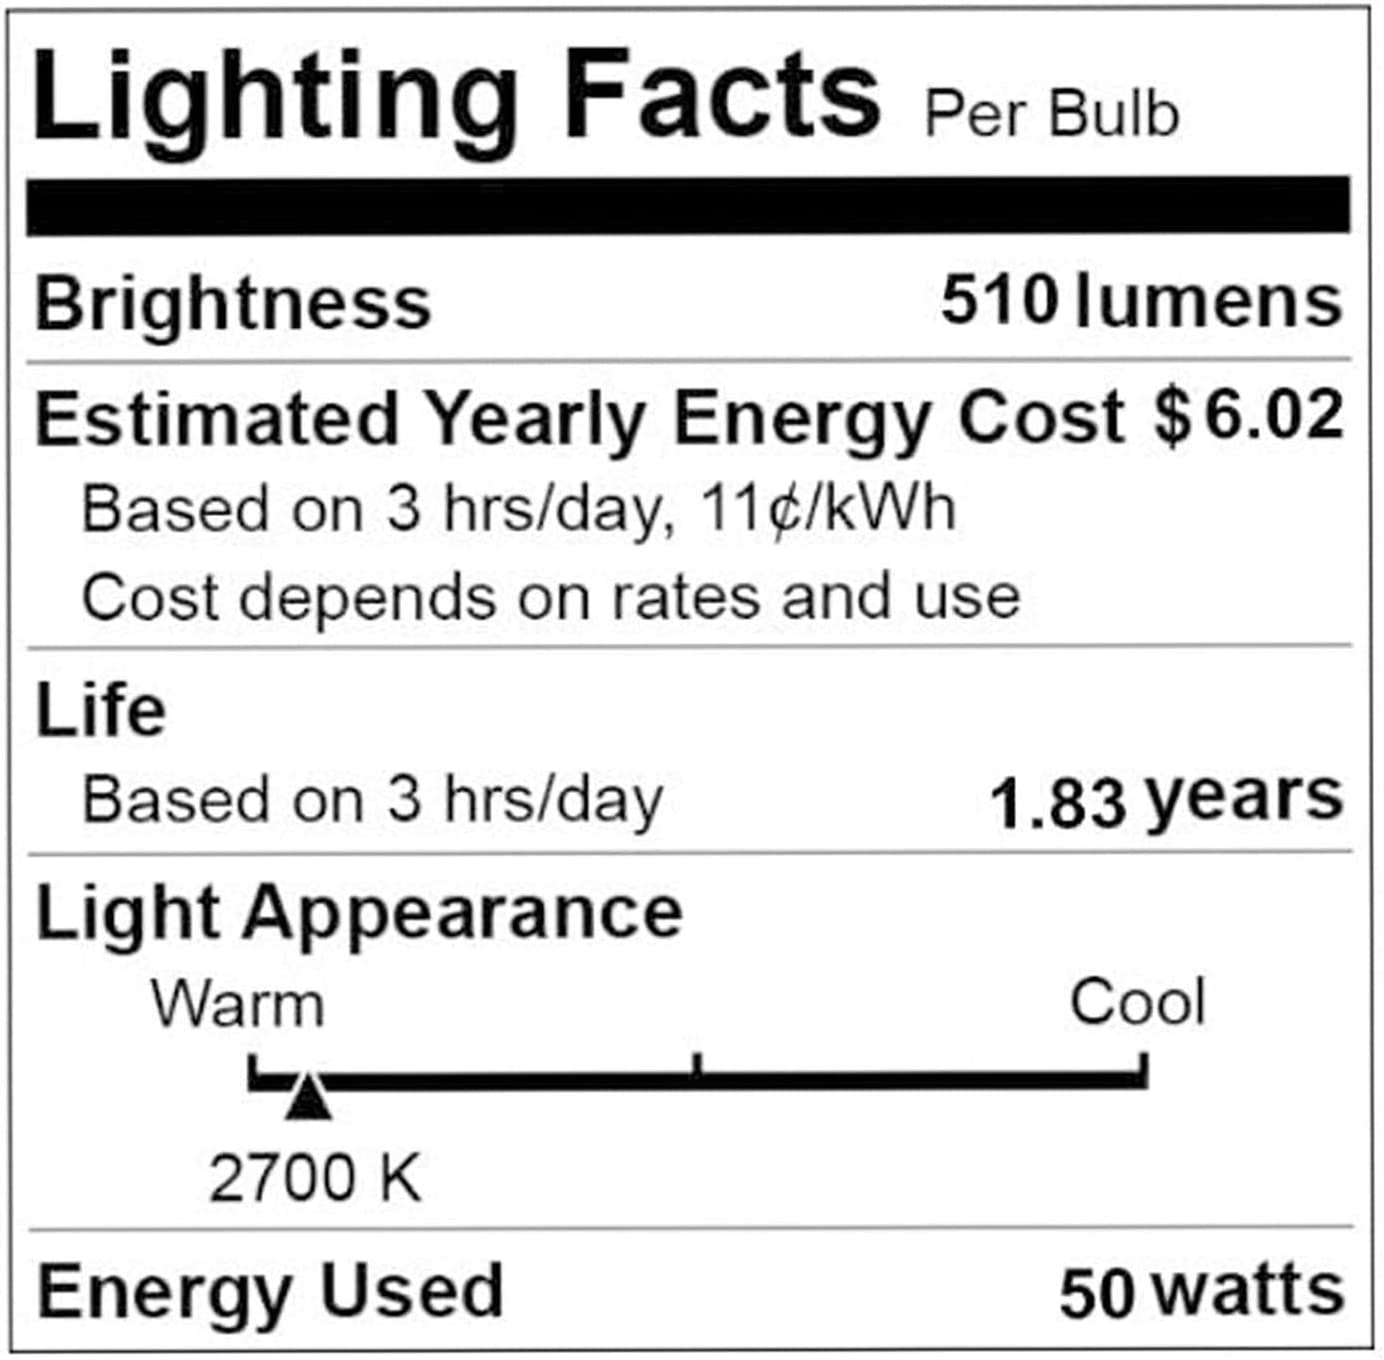 Pack of 10 G9 Base Bi-pin Halogen Bulbs T4 JCD Type 120-Volt 50 Watt Clear Warm White 2700K Wadoy G9 120V 50W Halogen Bulb